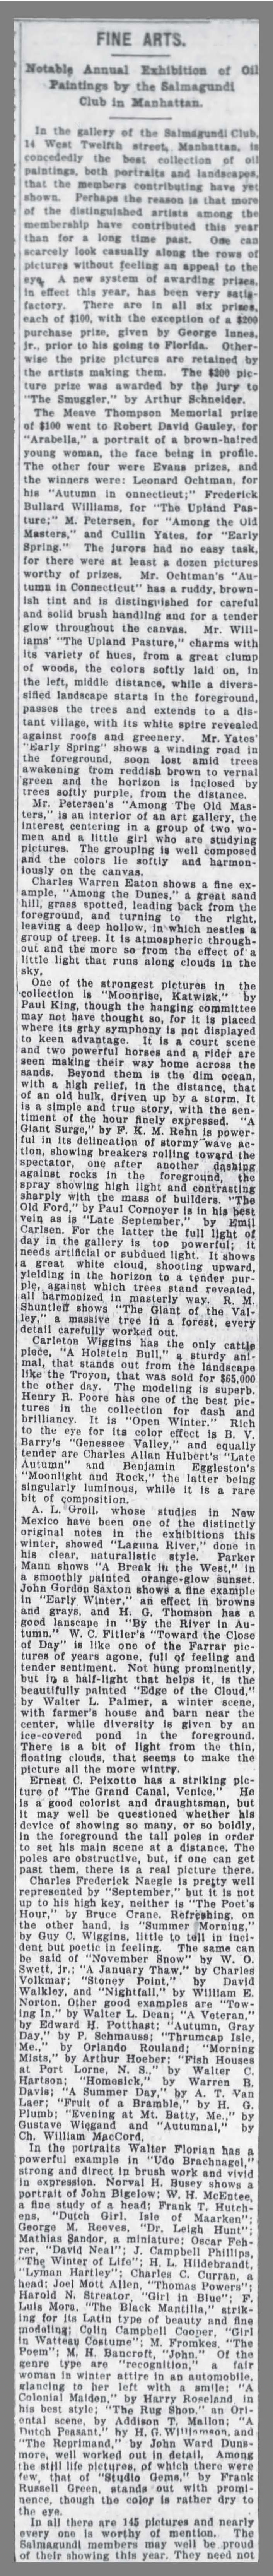 "The Brooklyn Daily Eagle, Brooklyn, NY, ""Fine Arts."", February 9, 1907, Page 4"